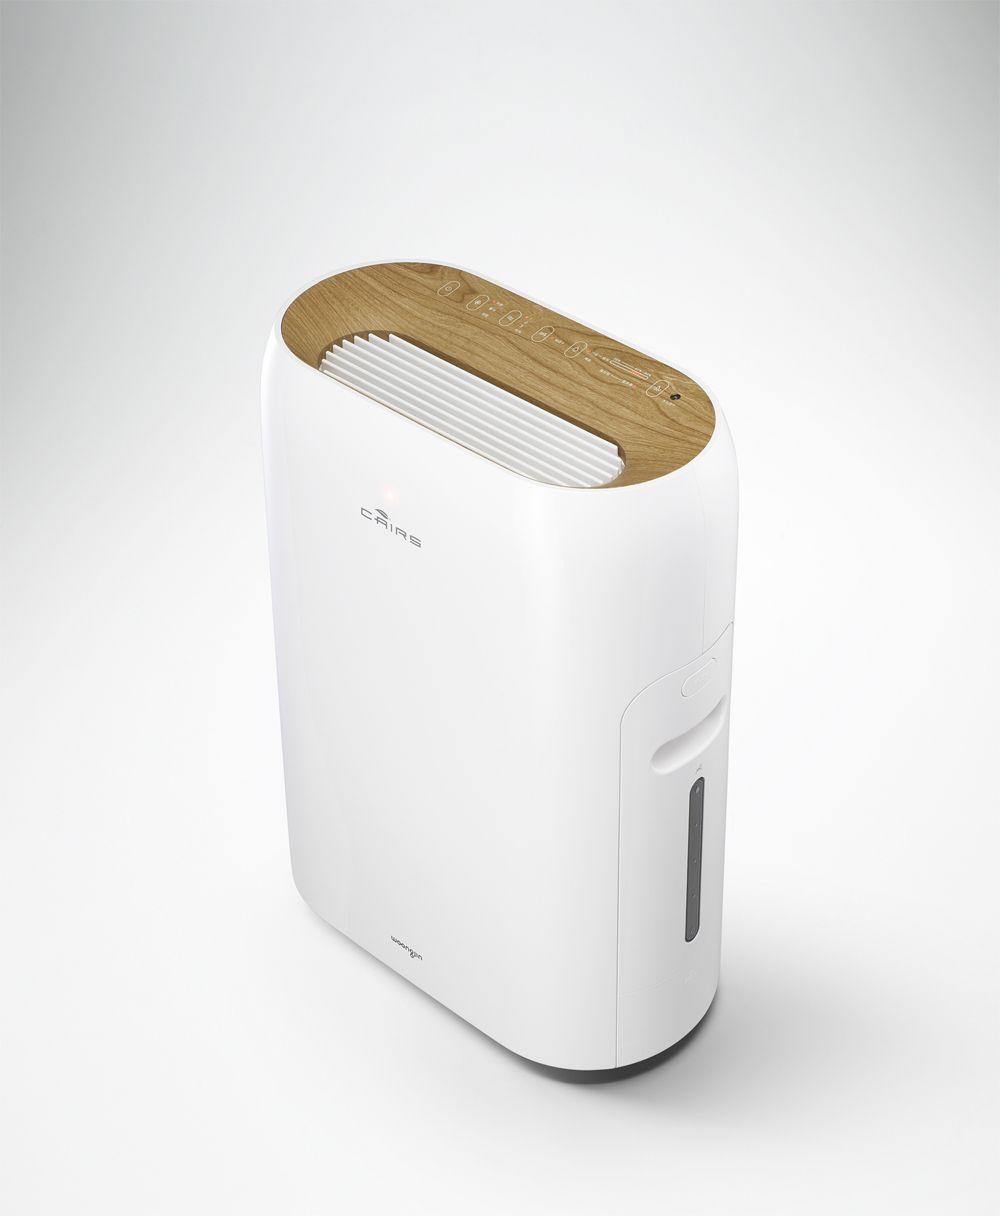 Apm 1211gh Multifunctional Air Purifier On Behance Air Purifier Buying Appliances Id Design